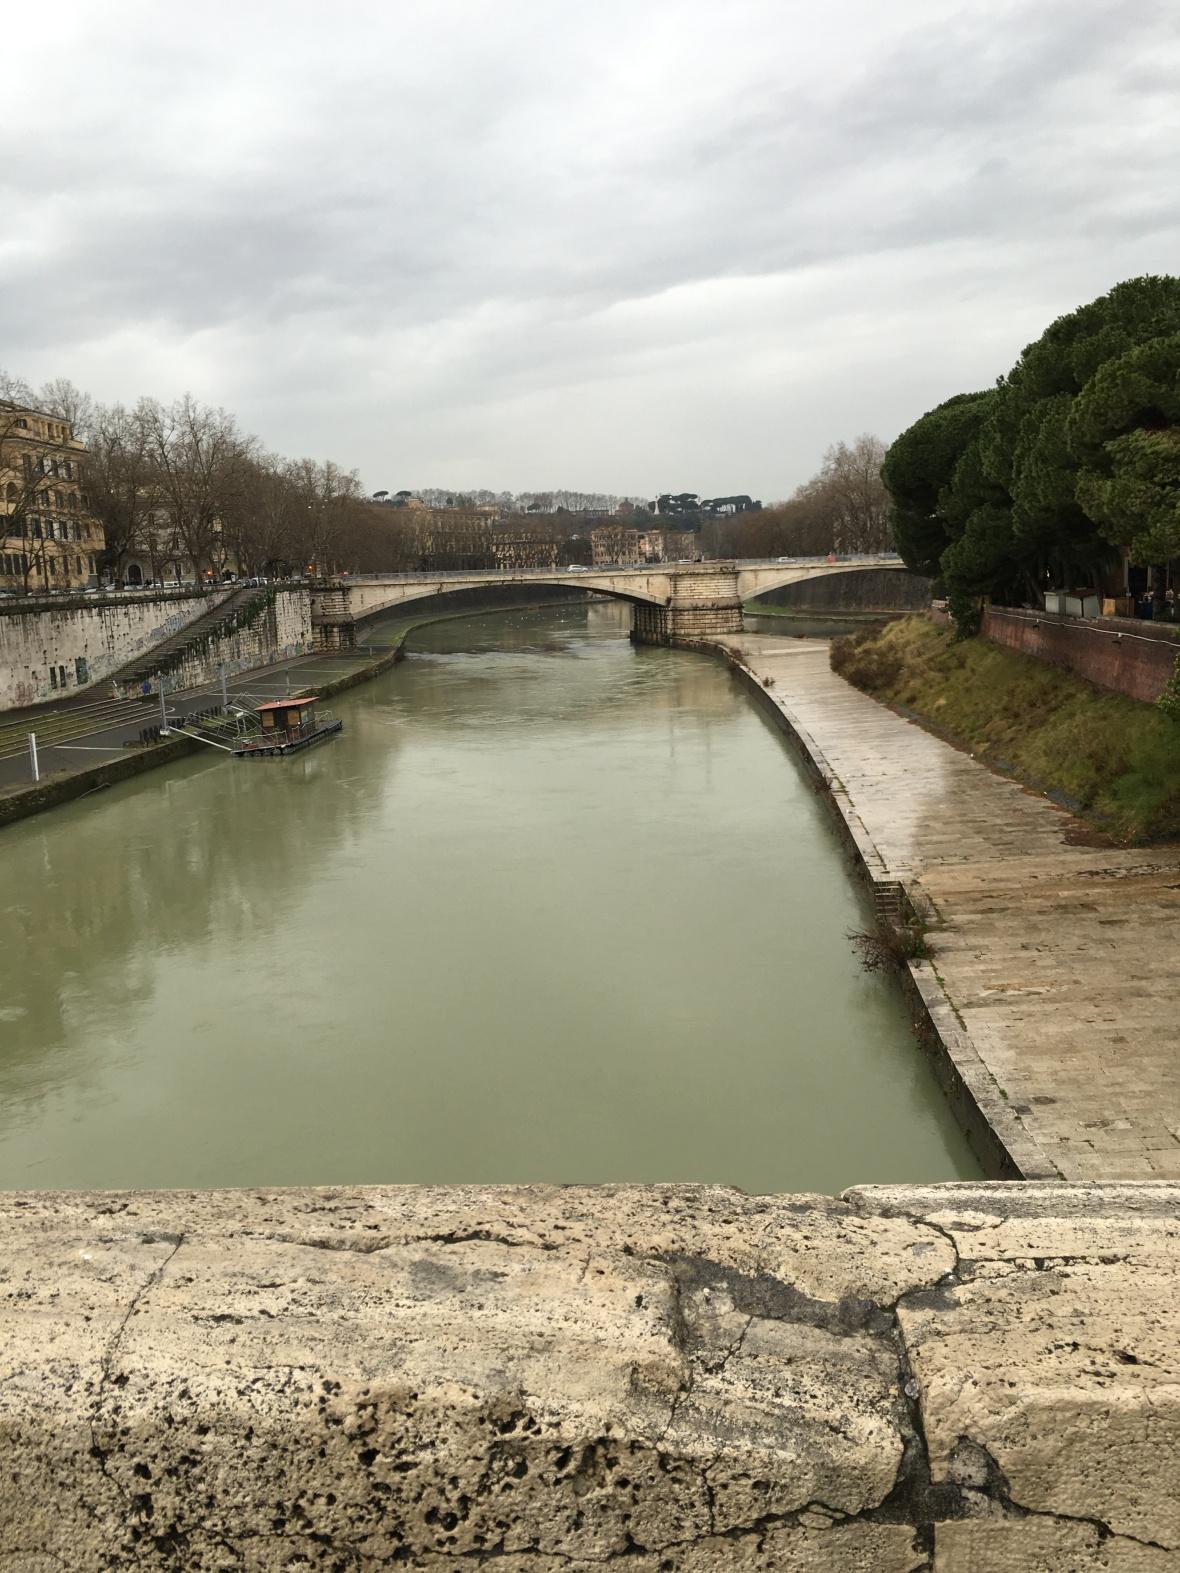 River Tiber, Isola Tiberina, Rome, Italy